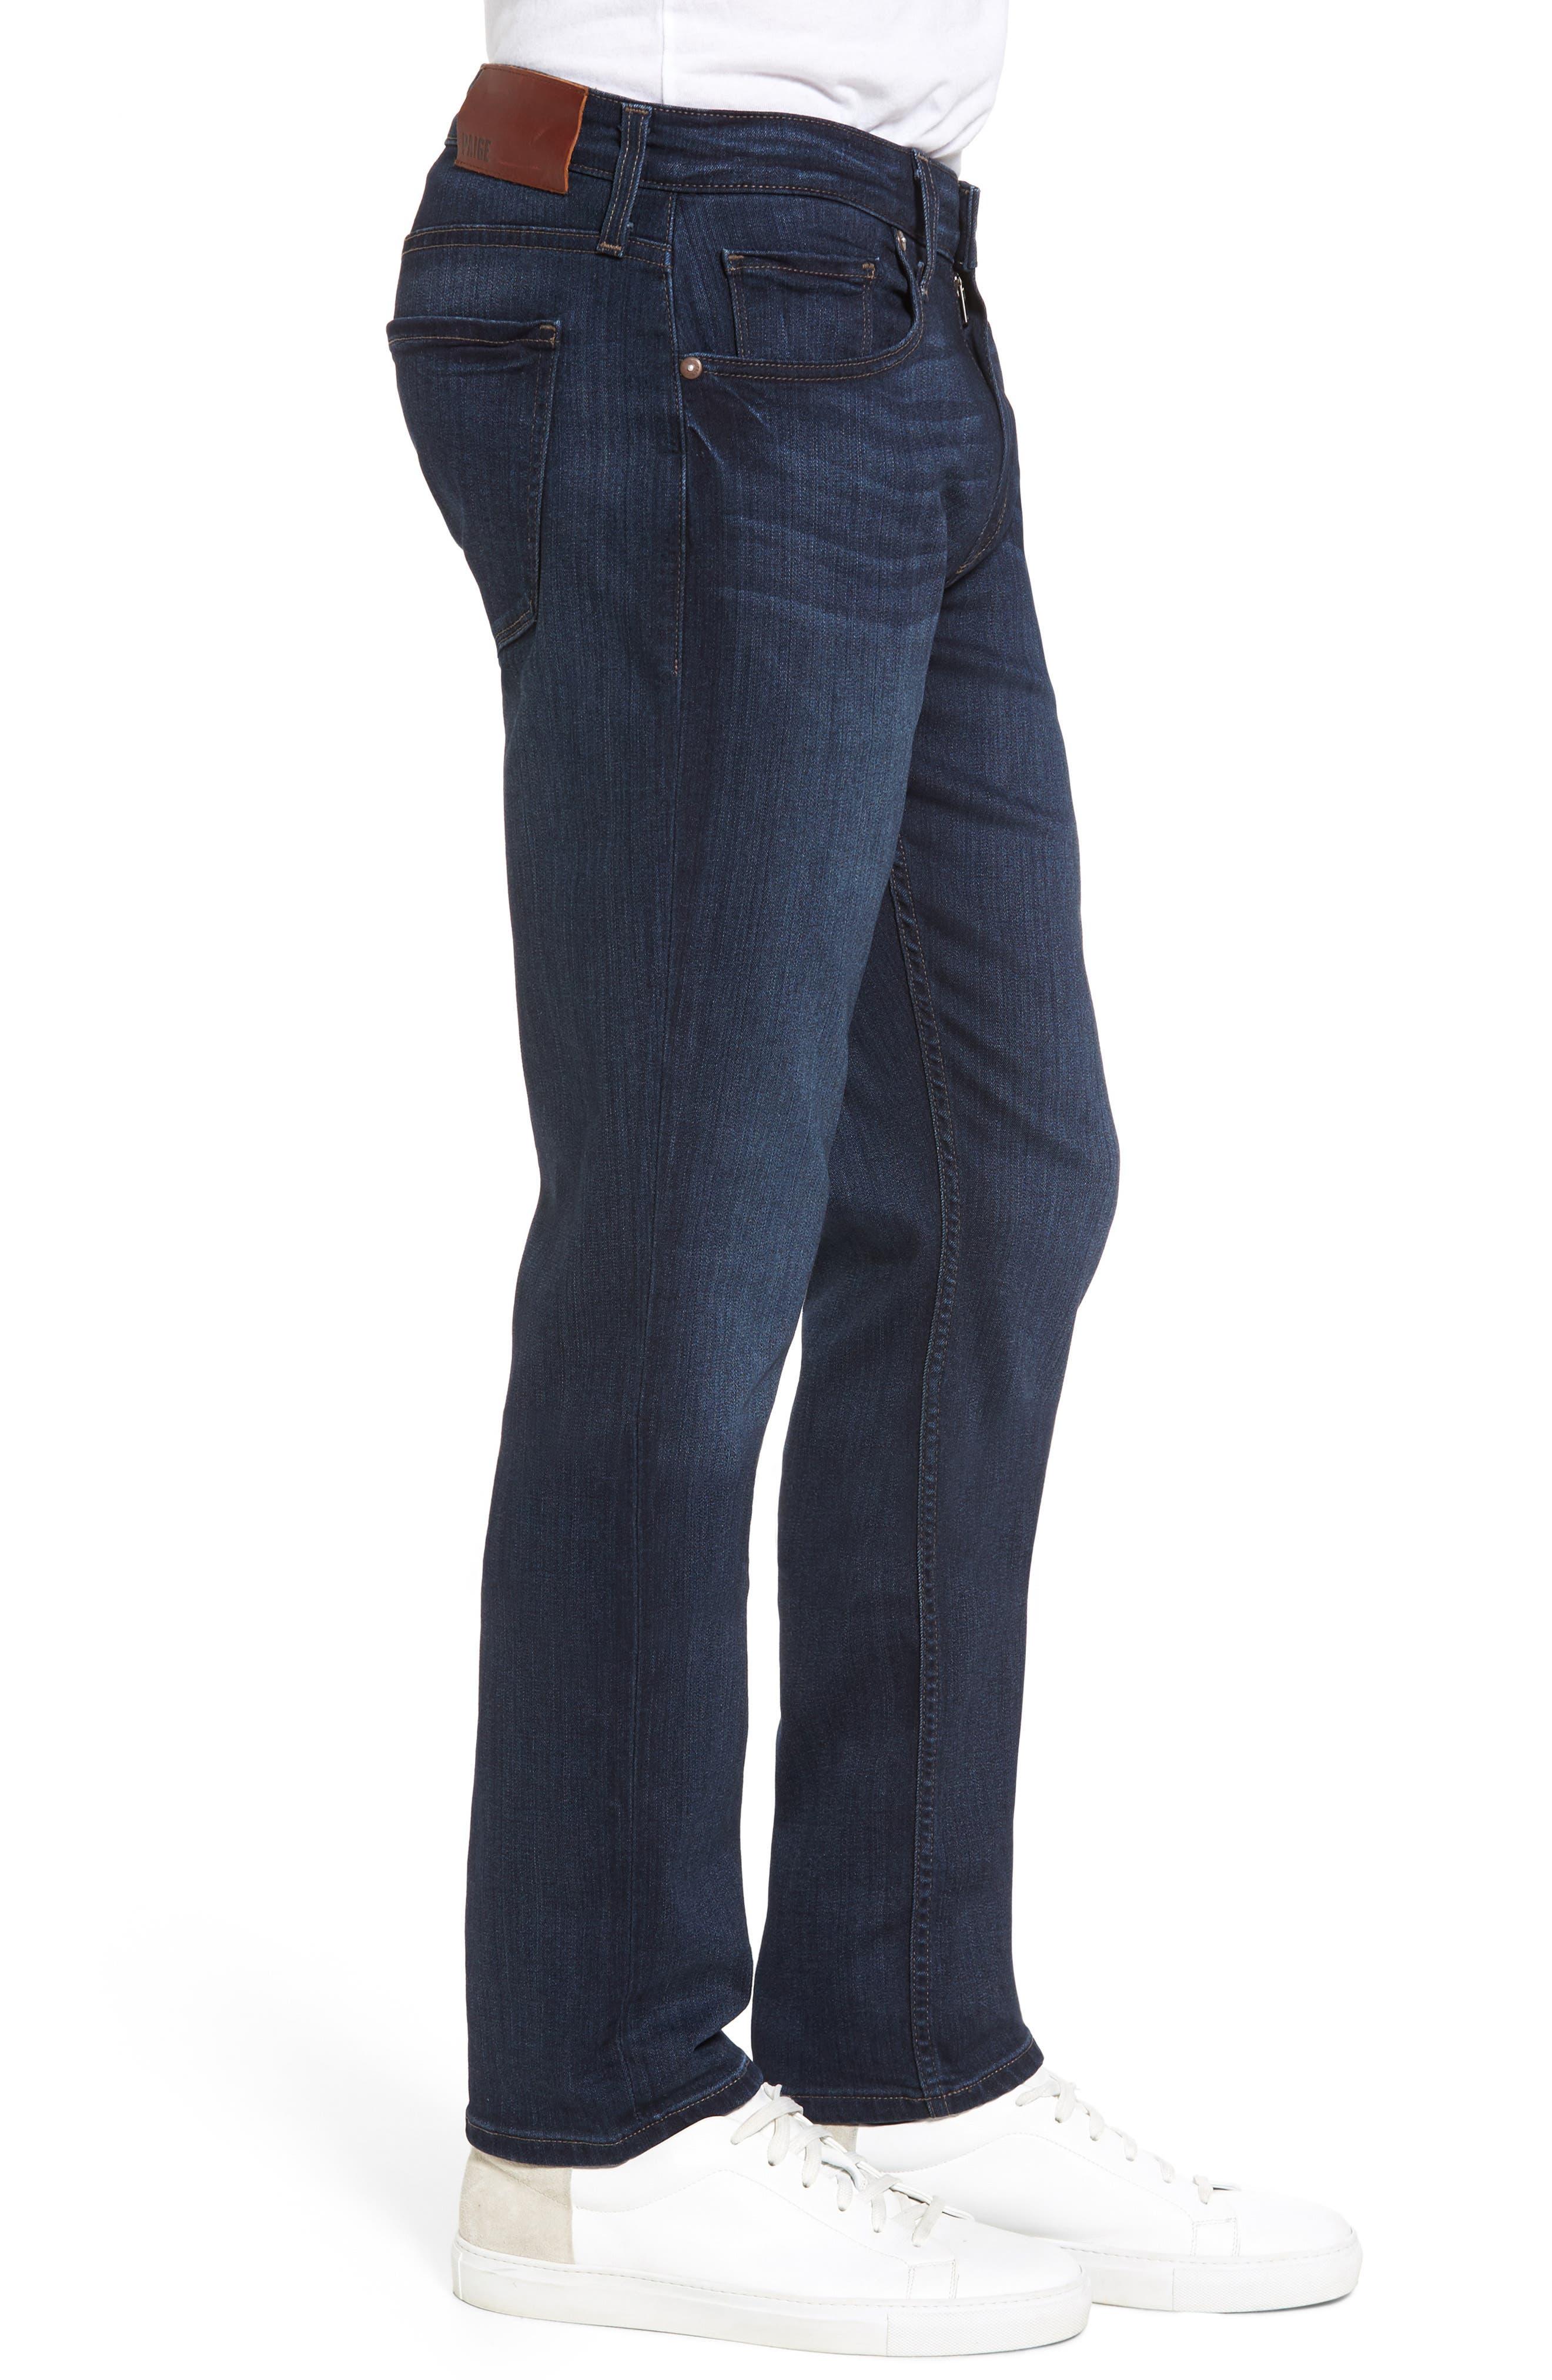 Transcend - Federal Slim Straight Leg Jeans,                             Alternate thumbnail 3, color,                             Barron